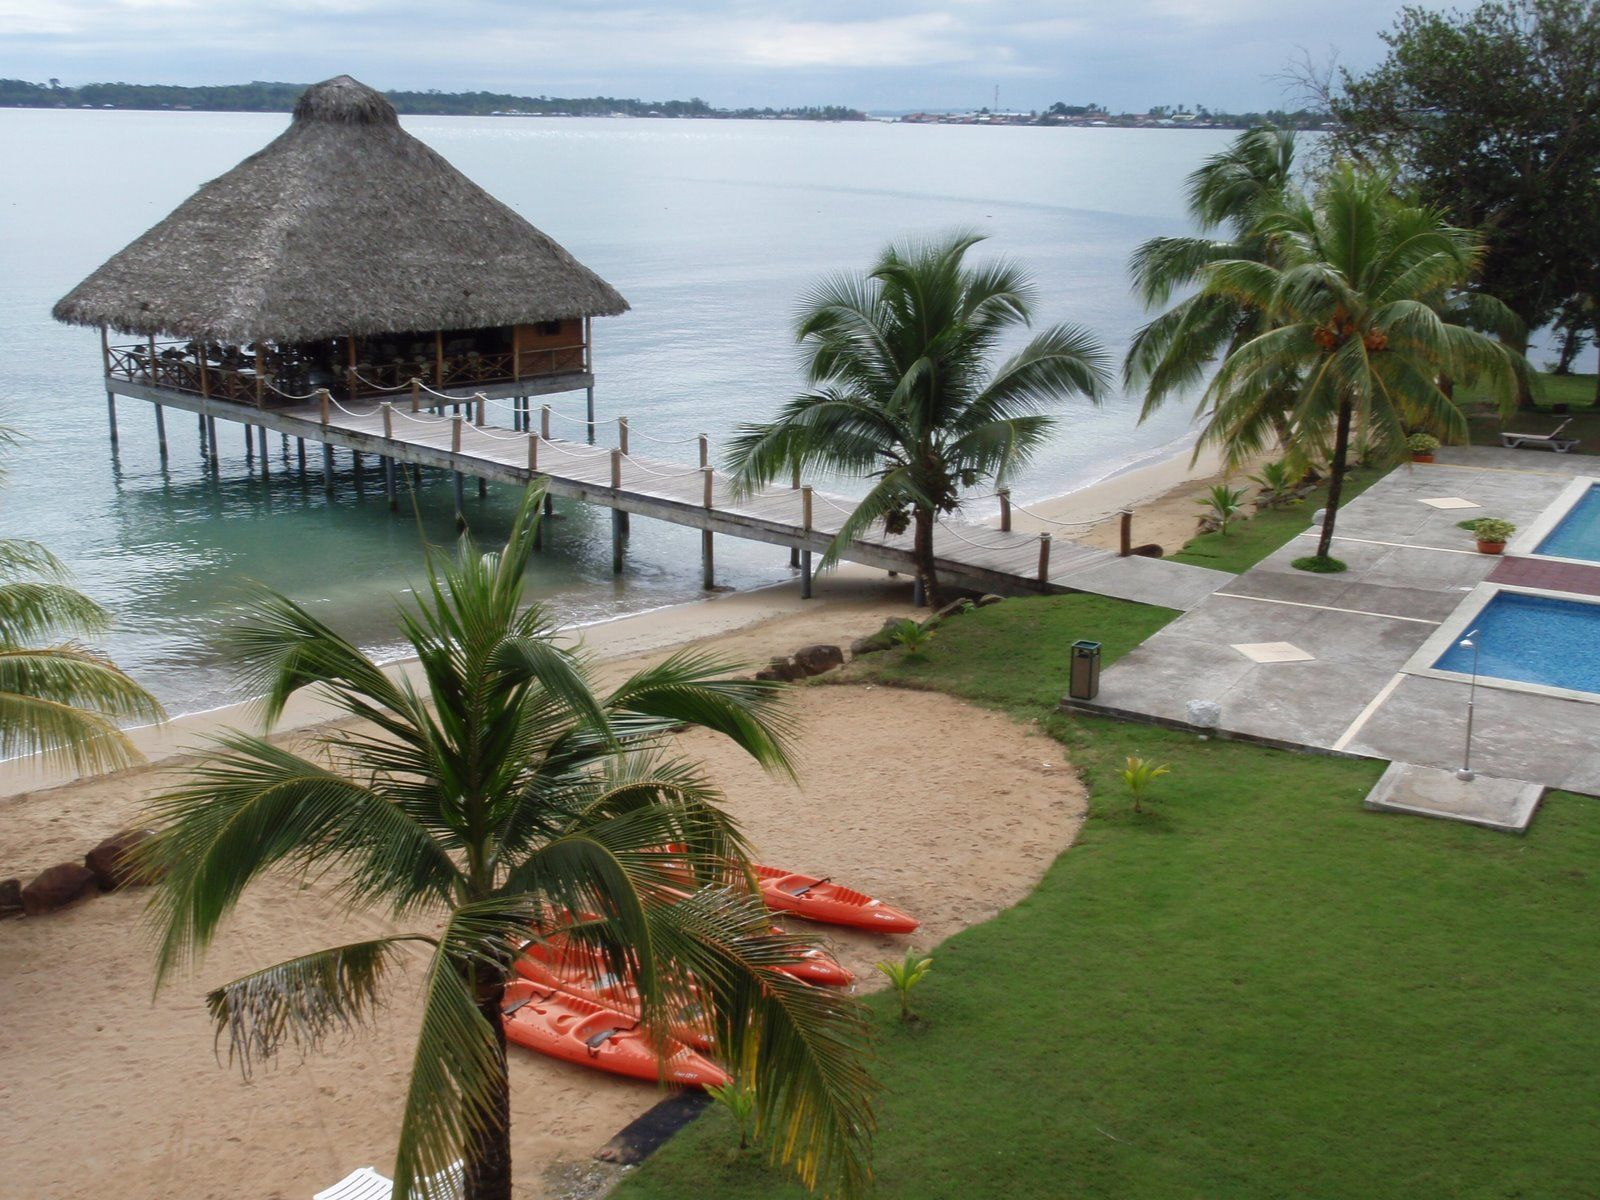 Bocas del toro hotels hotel playa tortuga bocas del toro hotels bocas del